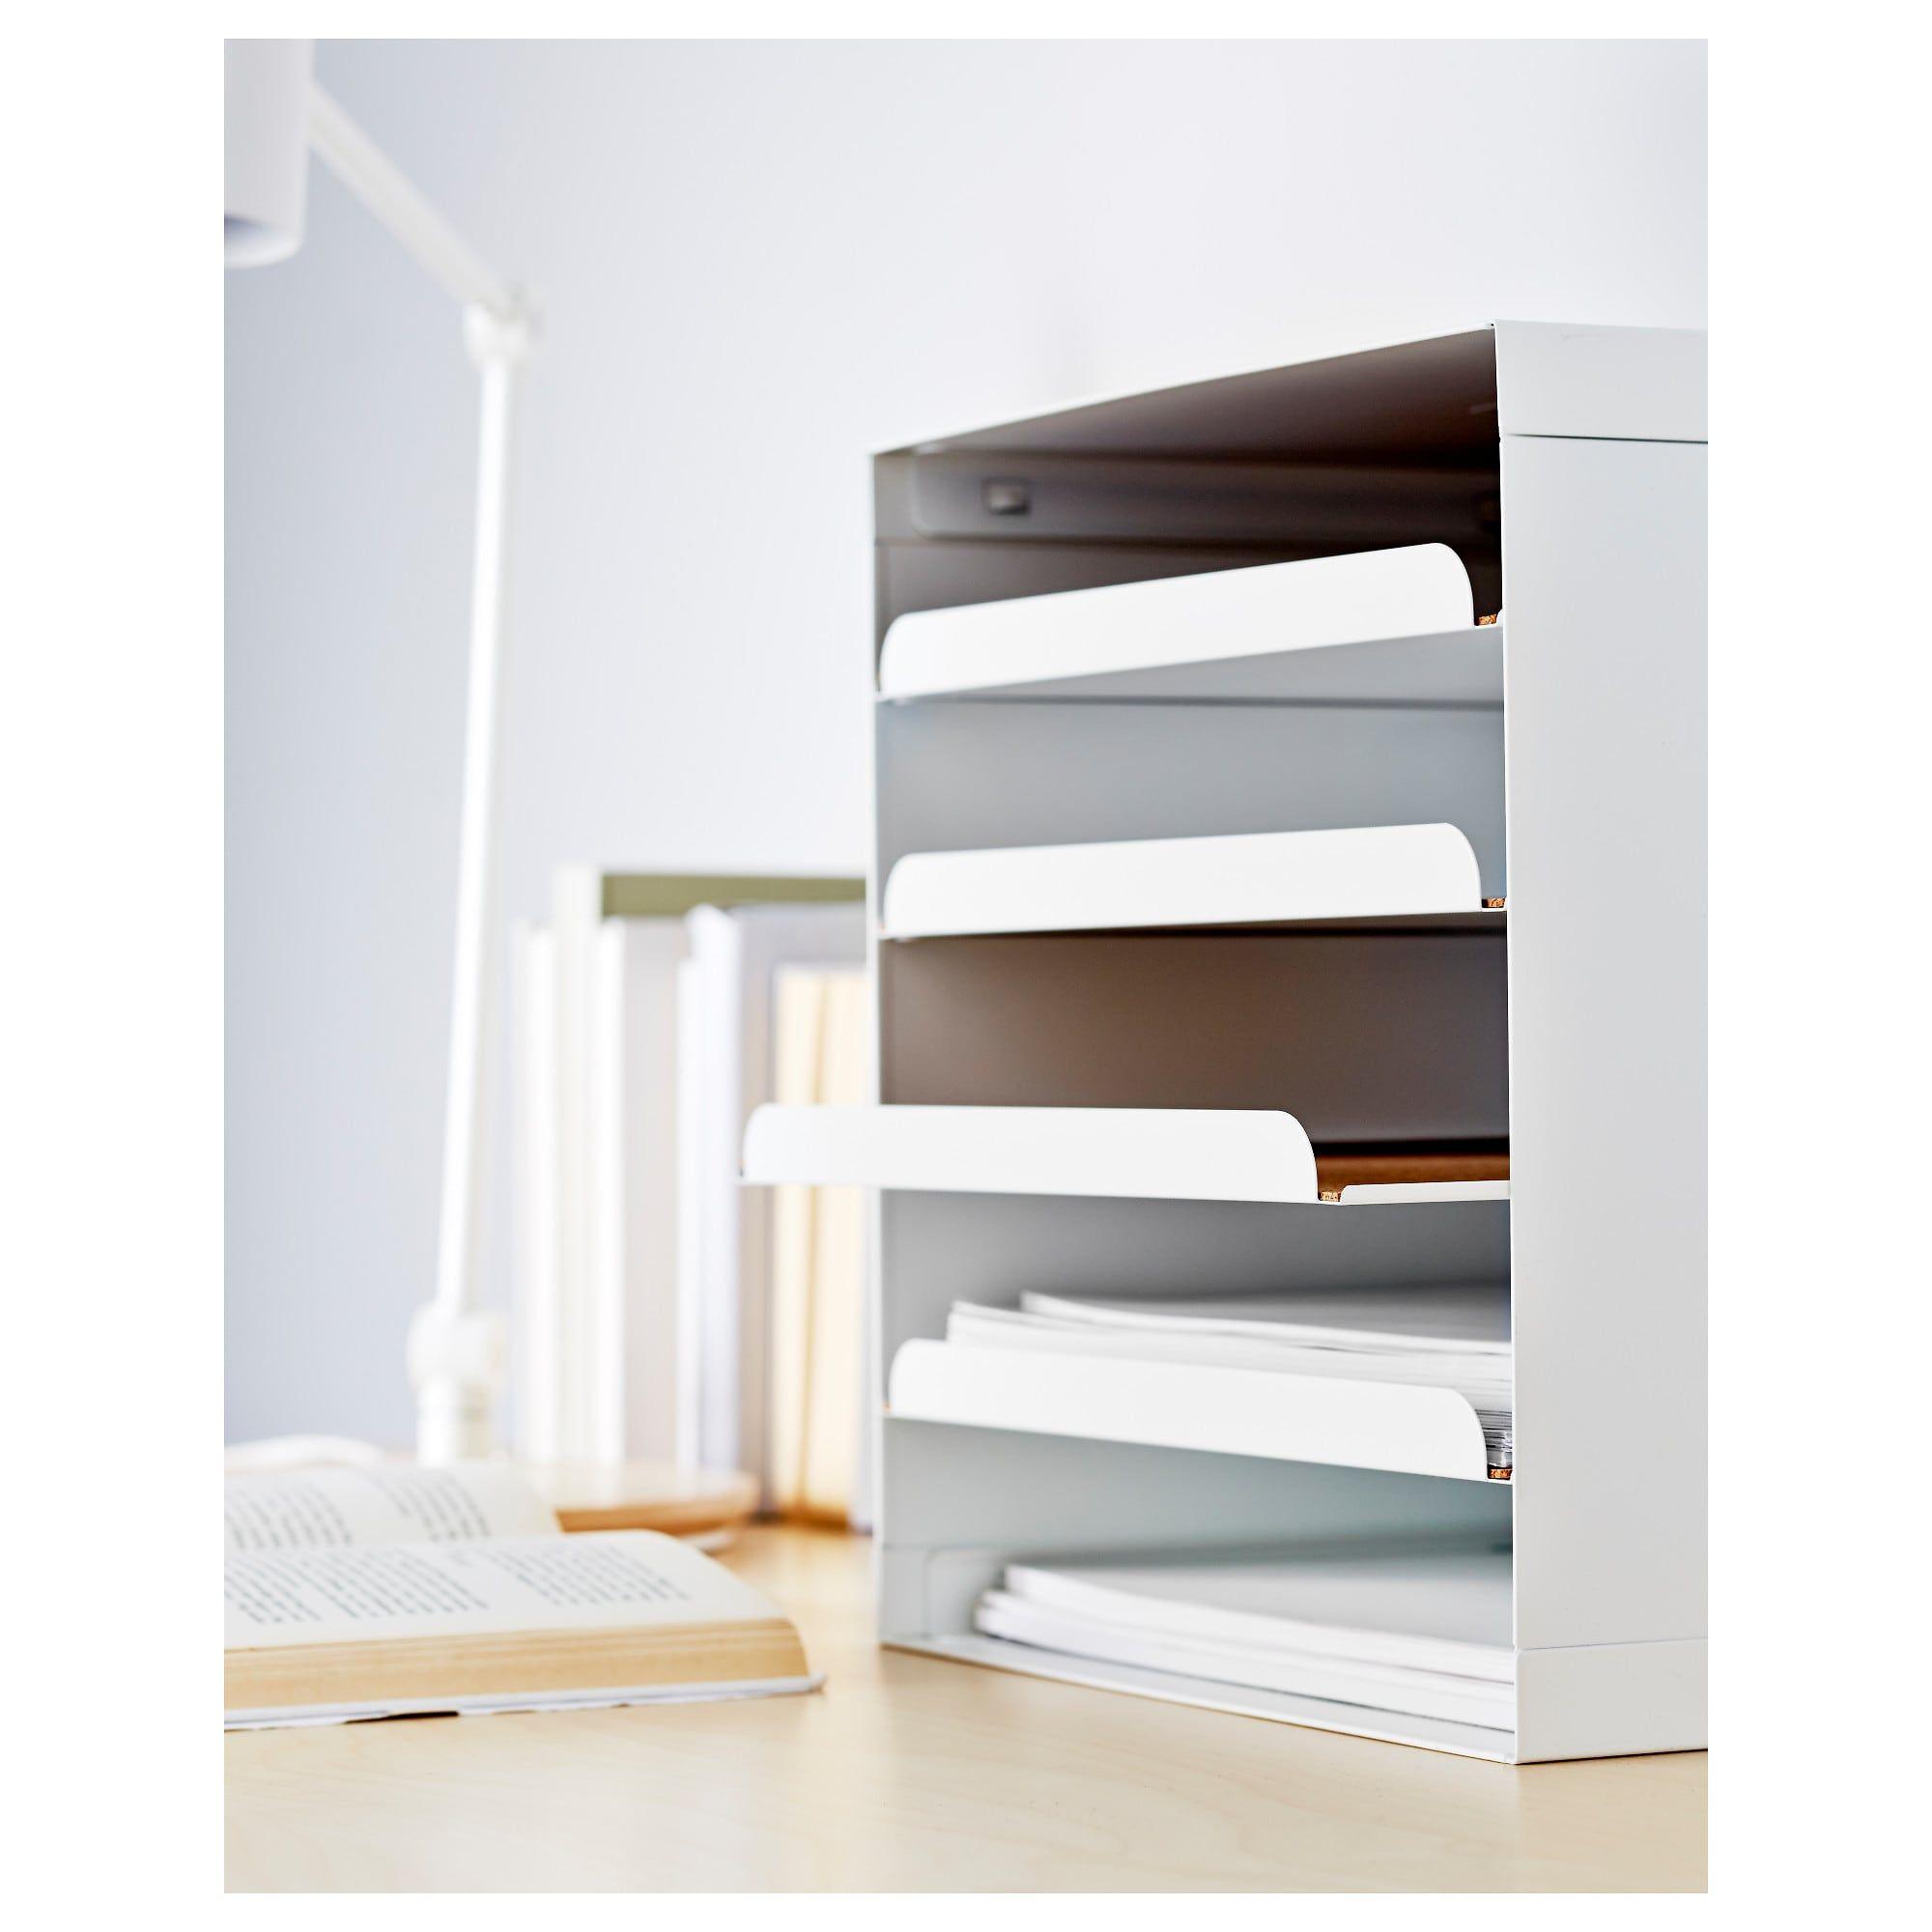 Kvissle White Letter Tray Ikea Letter Tray Ikea Desk Accessories